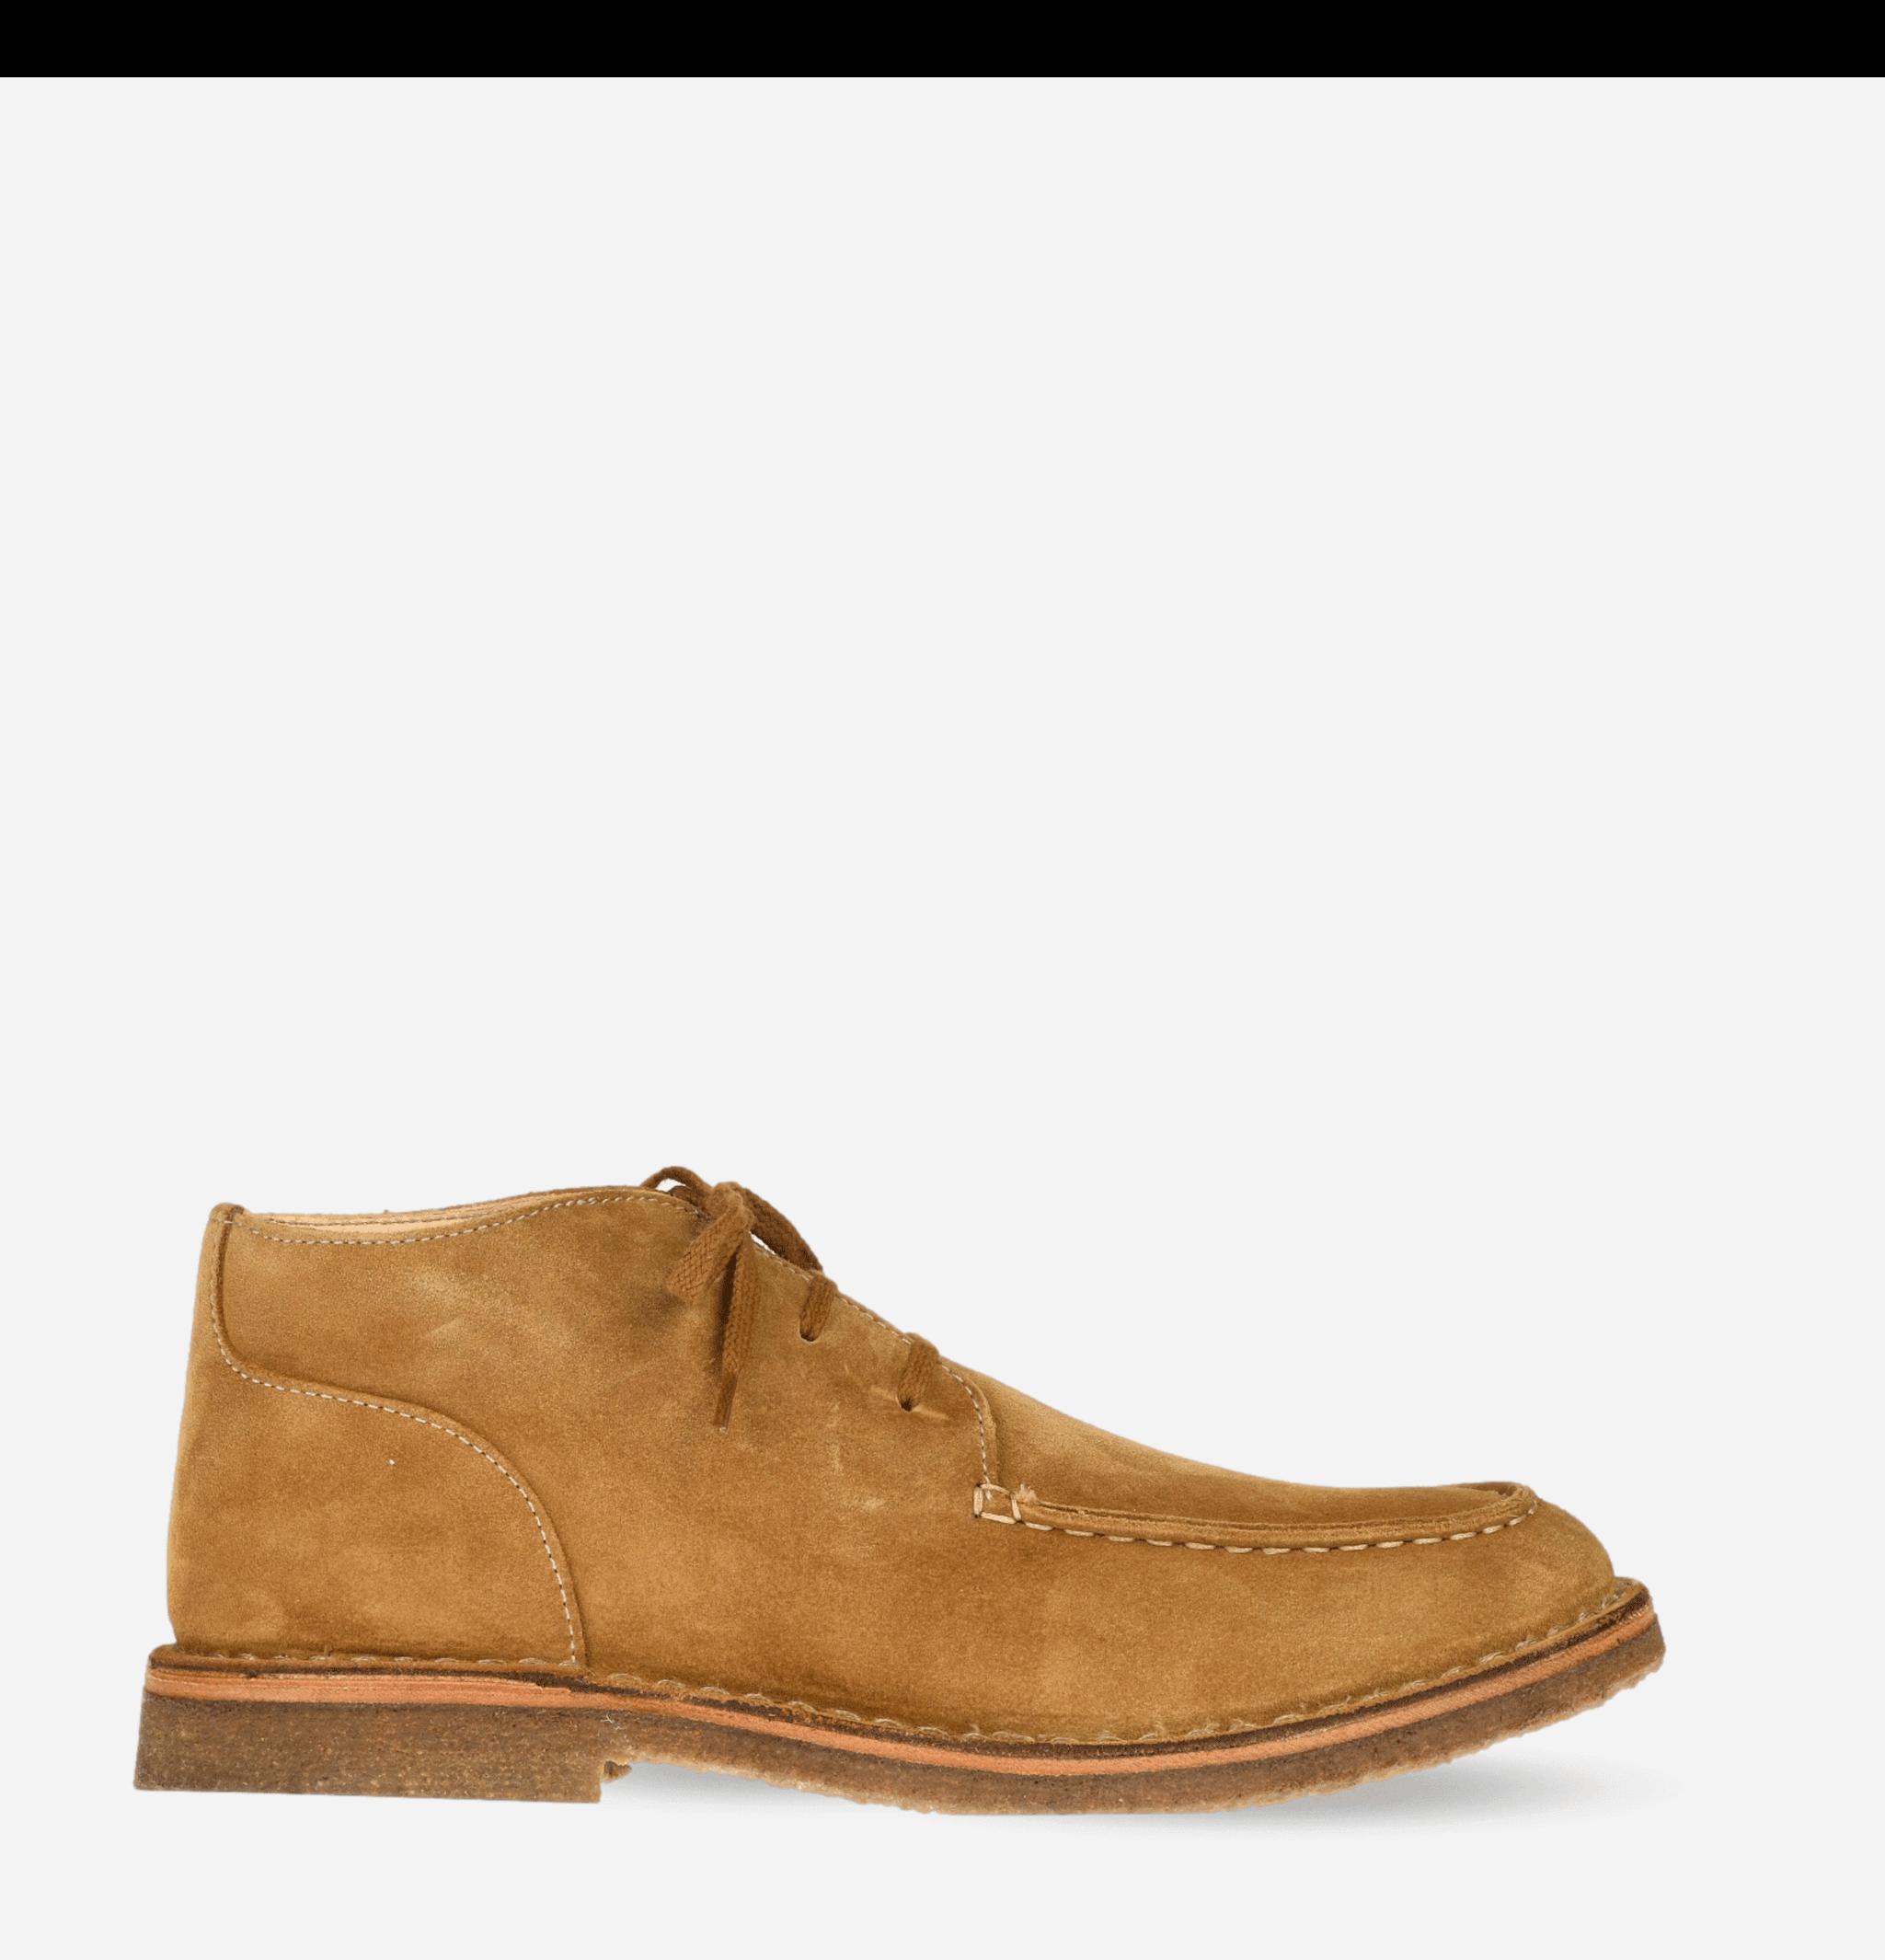 Deuxflex Boots Whisky